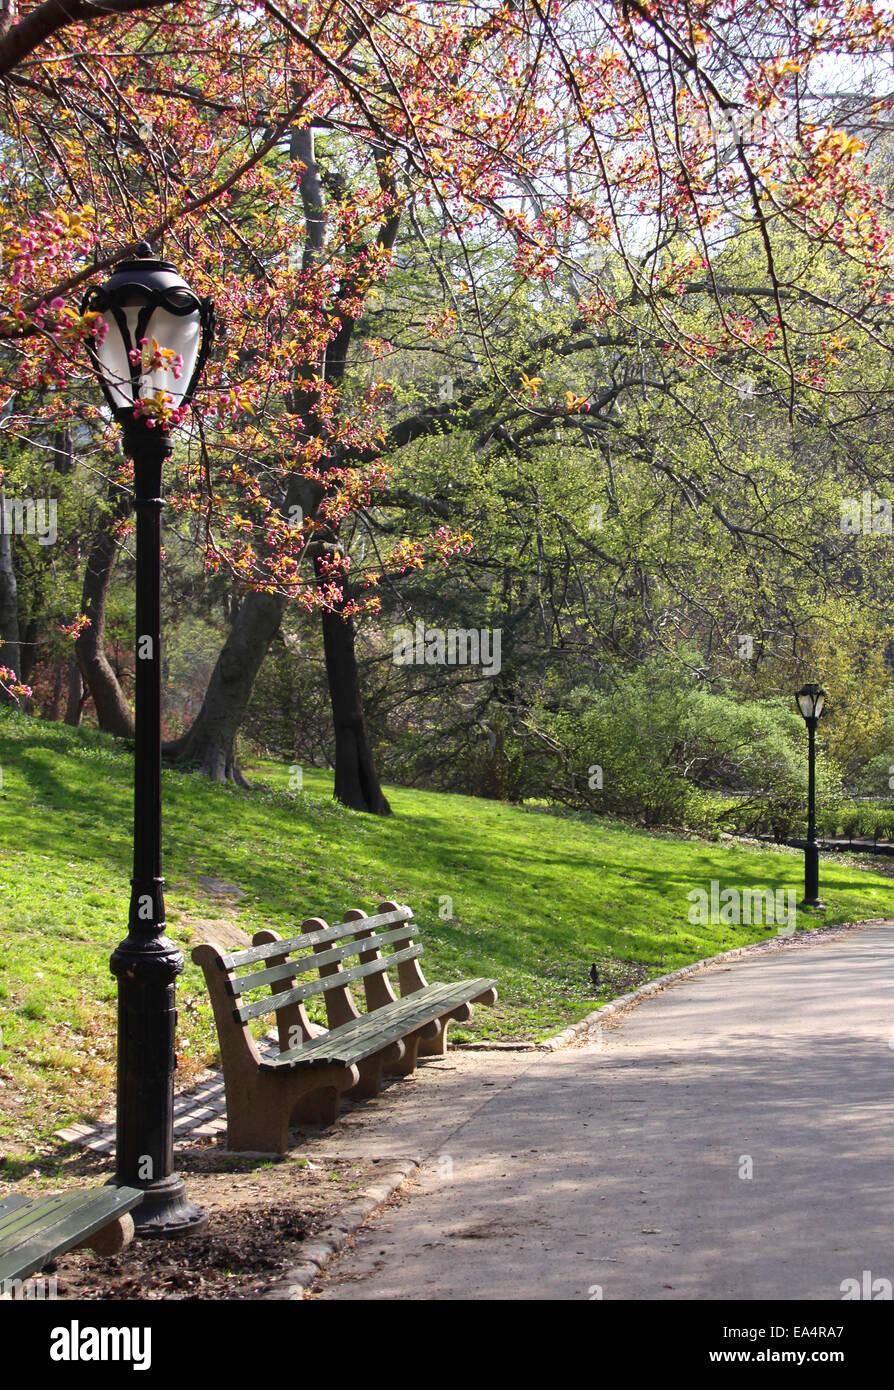 Central Park New York Spring Stock Photos & Central Park New York ...